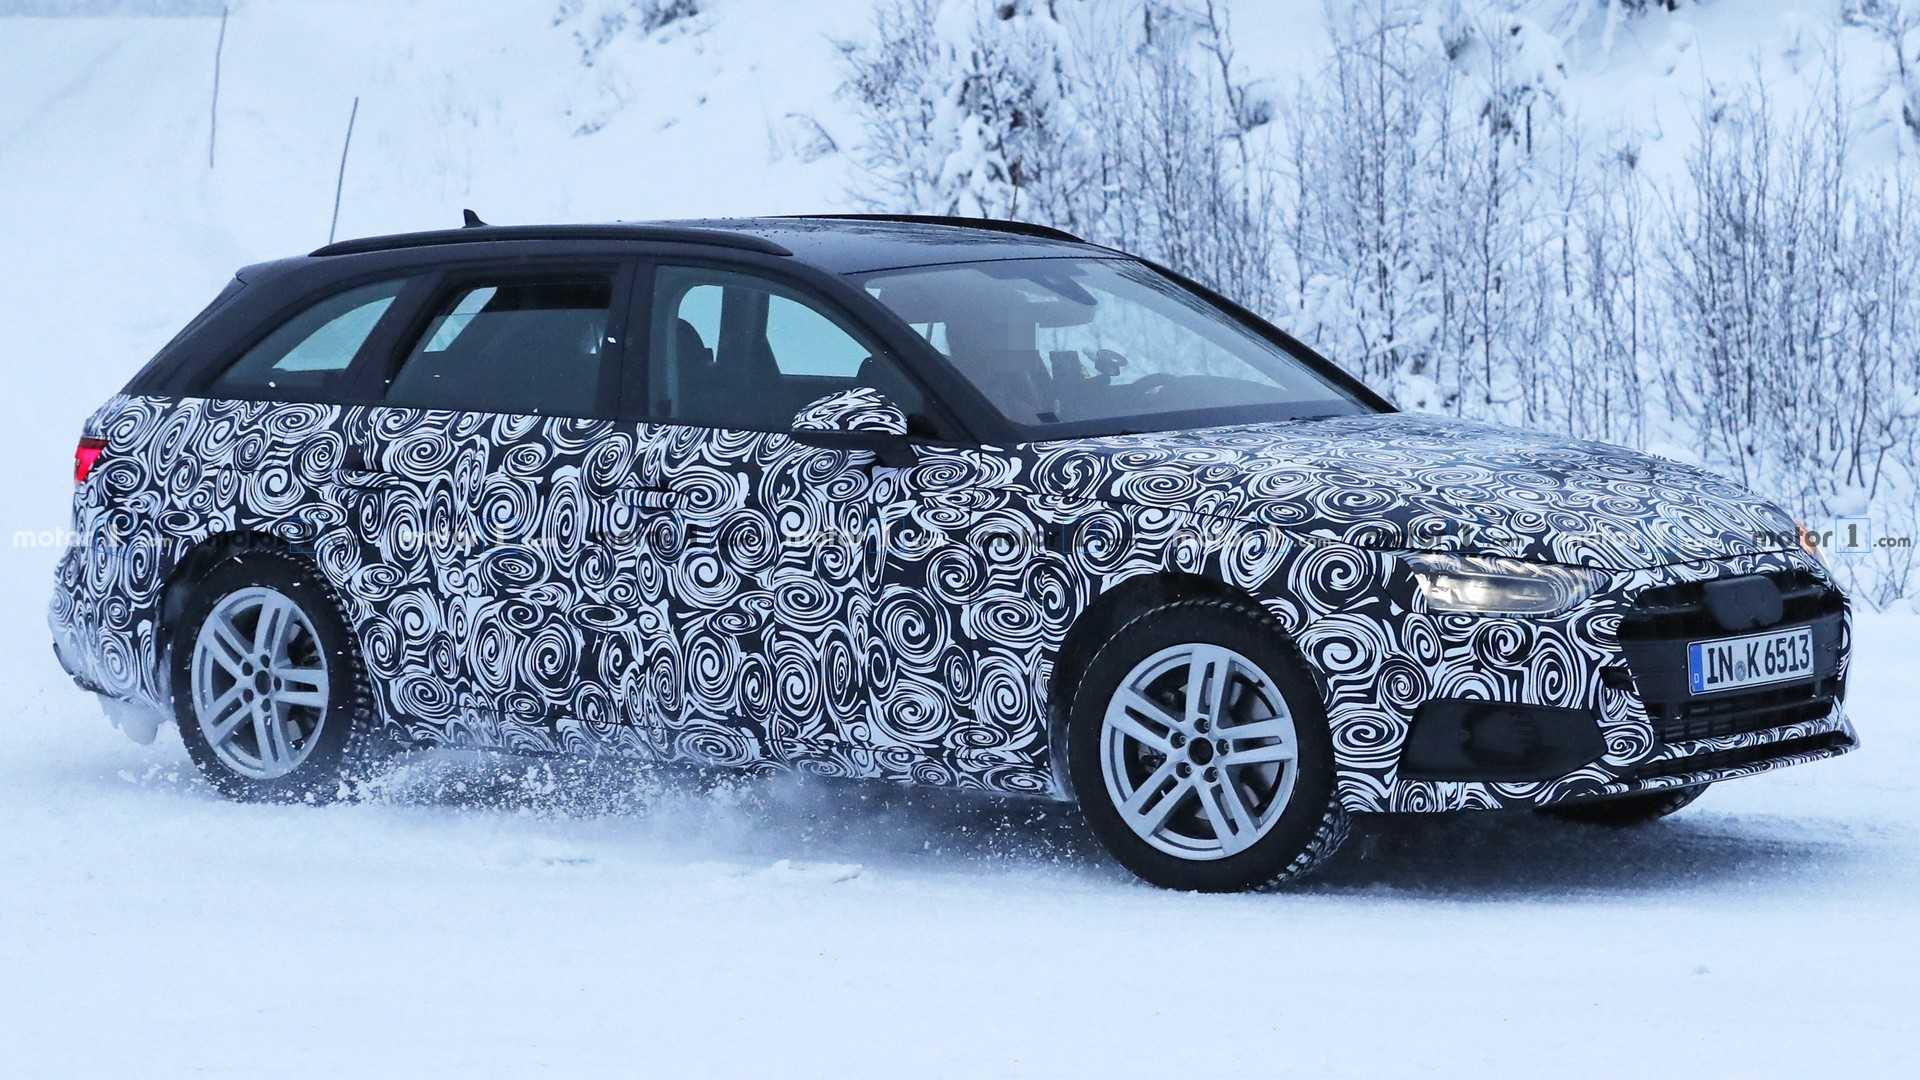 Audi A4 Avant Spied Hiding Major Refresh Update